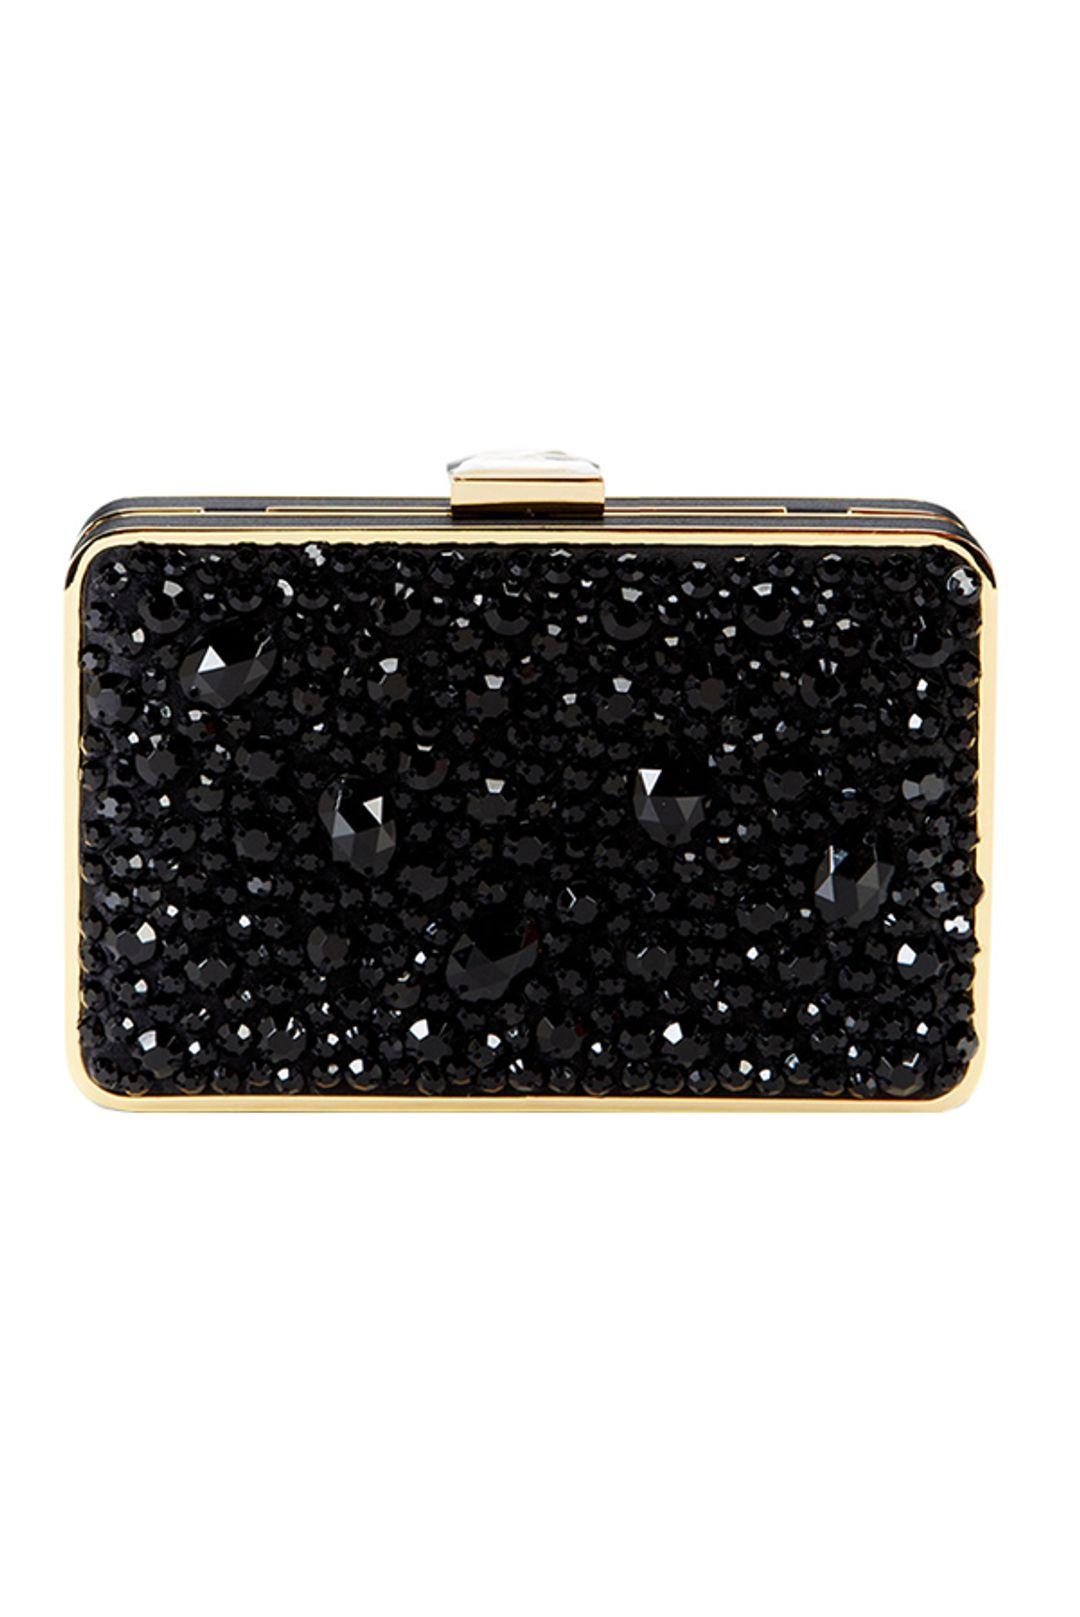 Franchi - Black Jewel Box - Black - Front